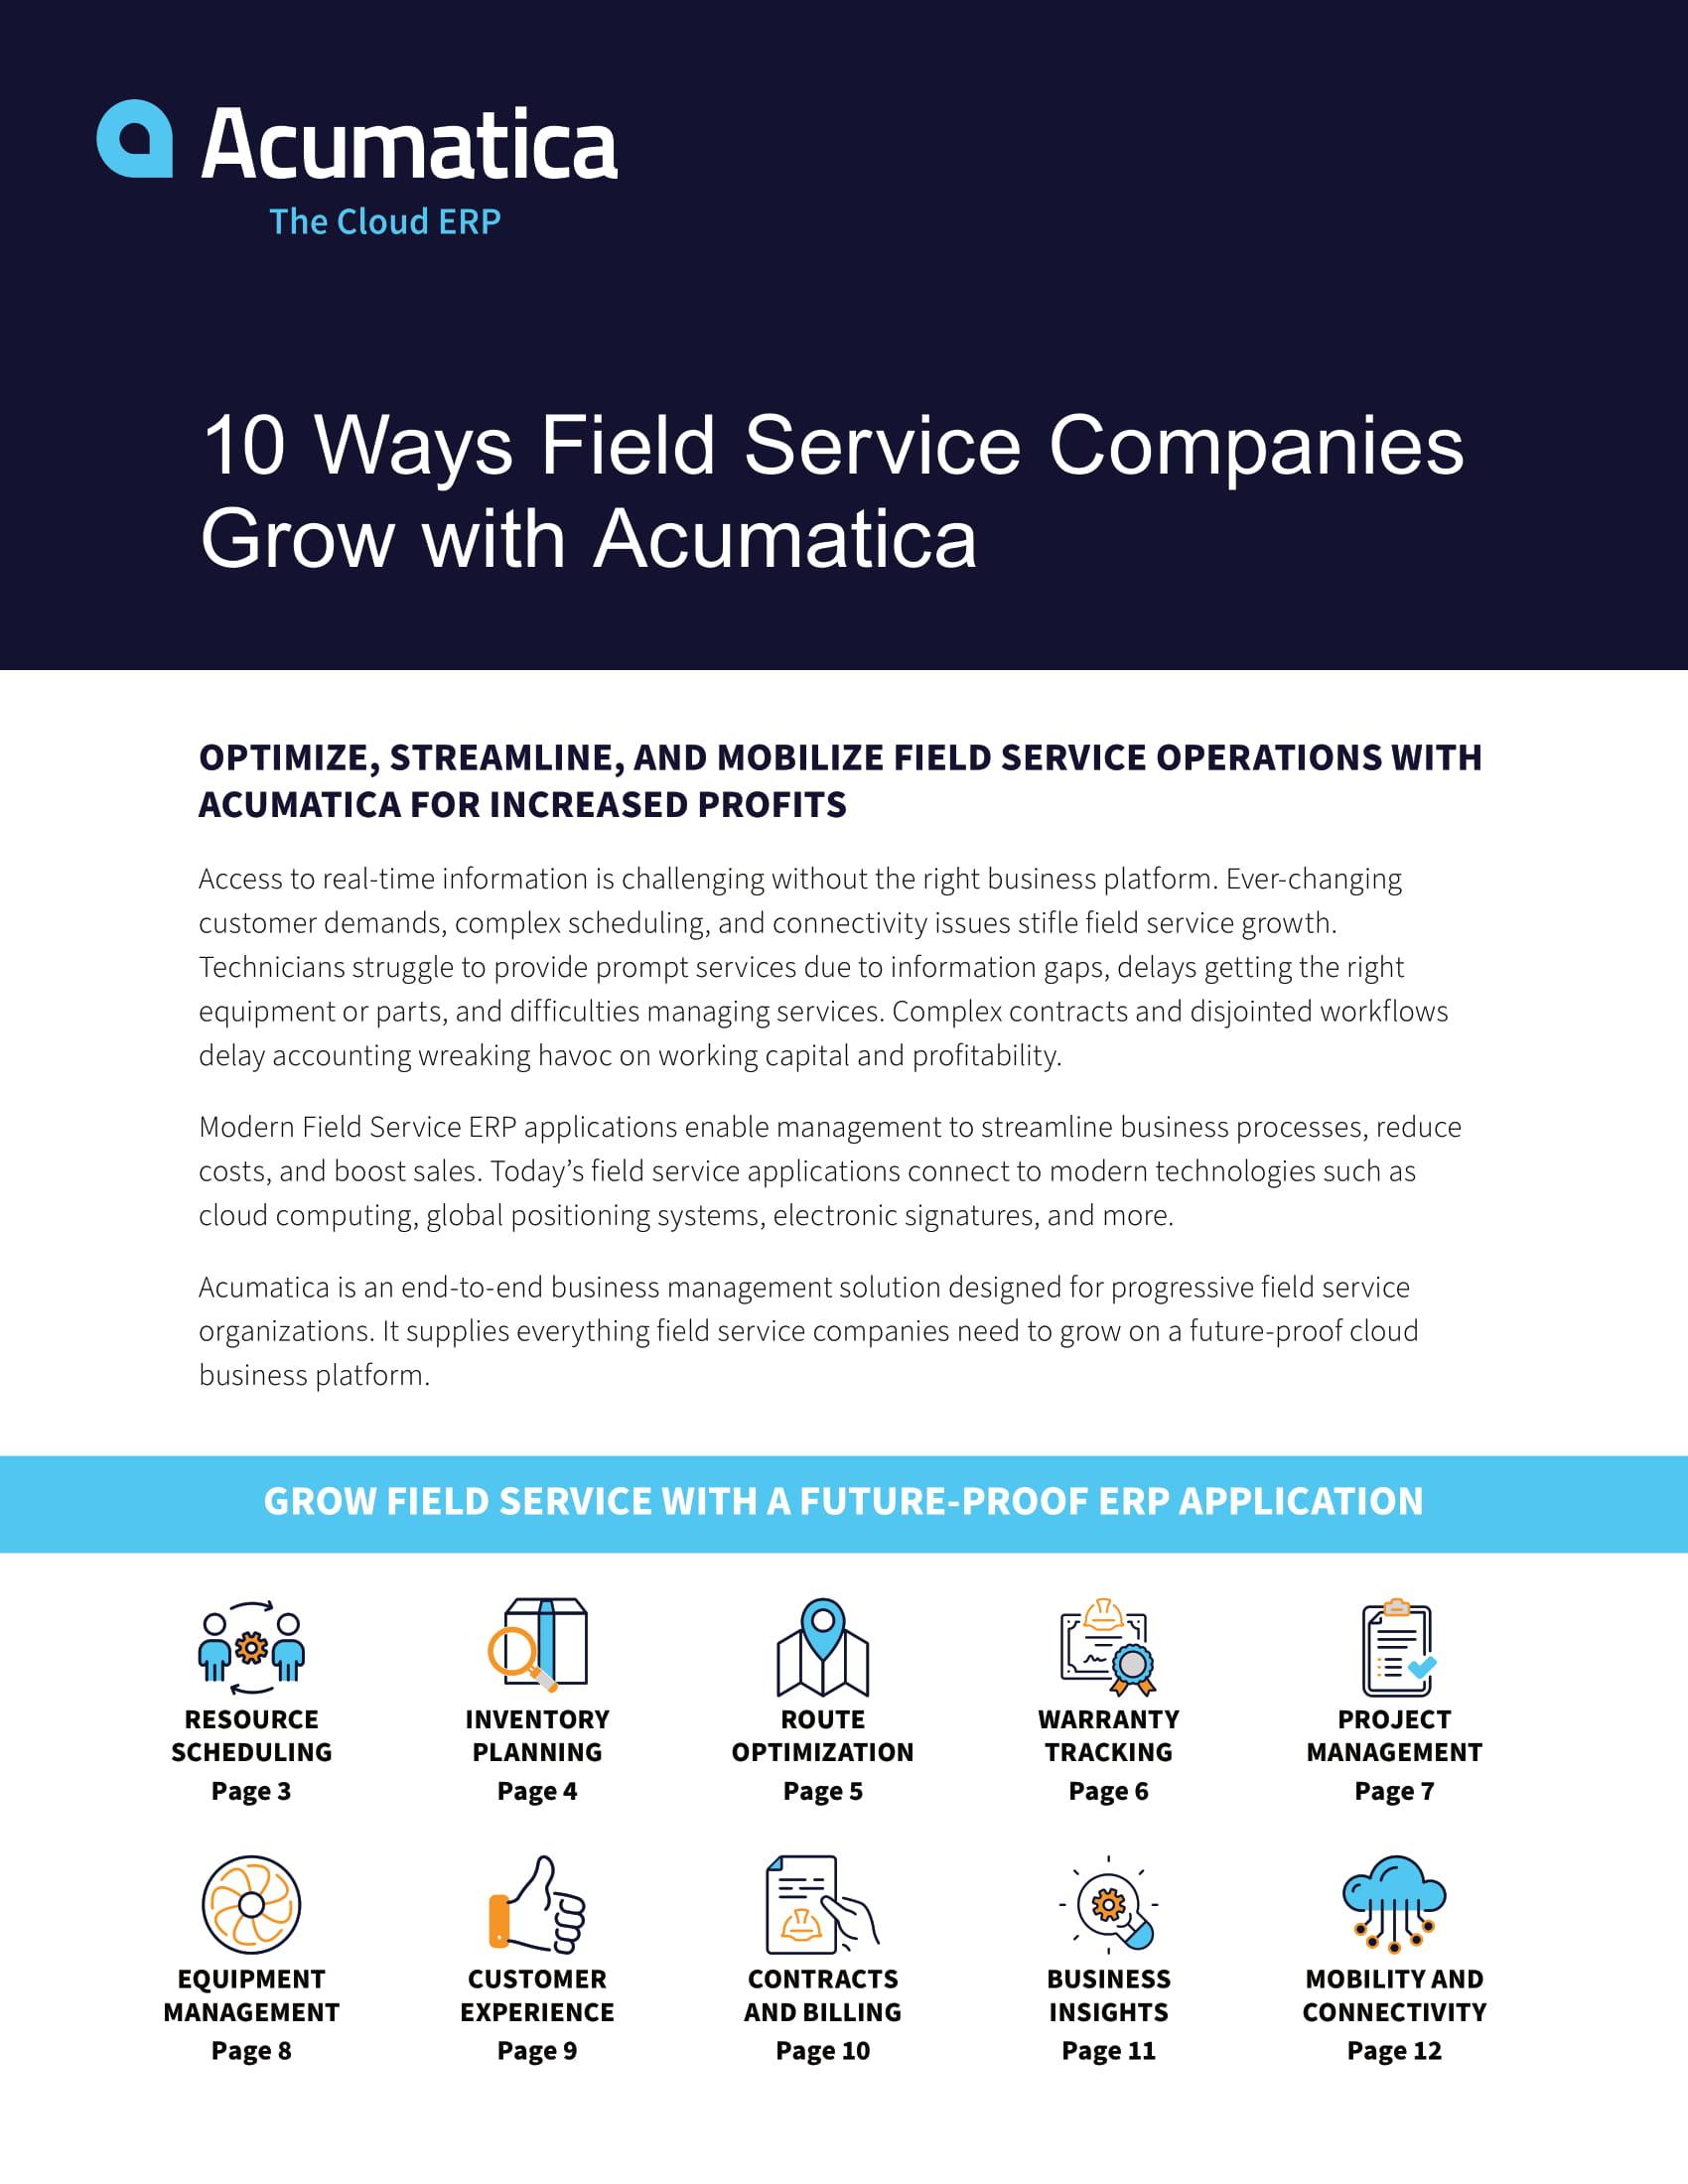 10 Ways Field Service Companies Grow with Acumatica